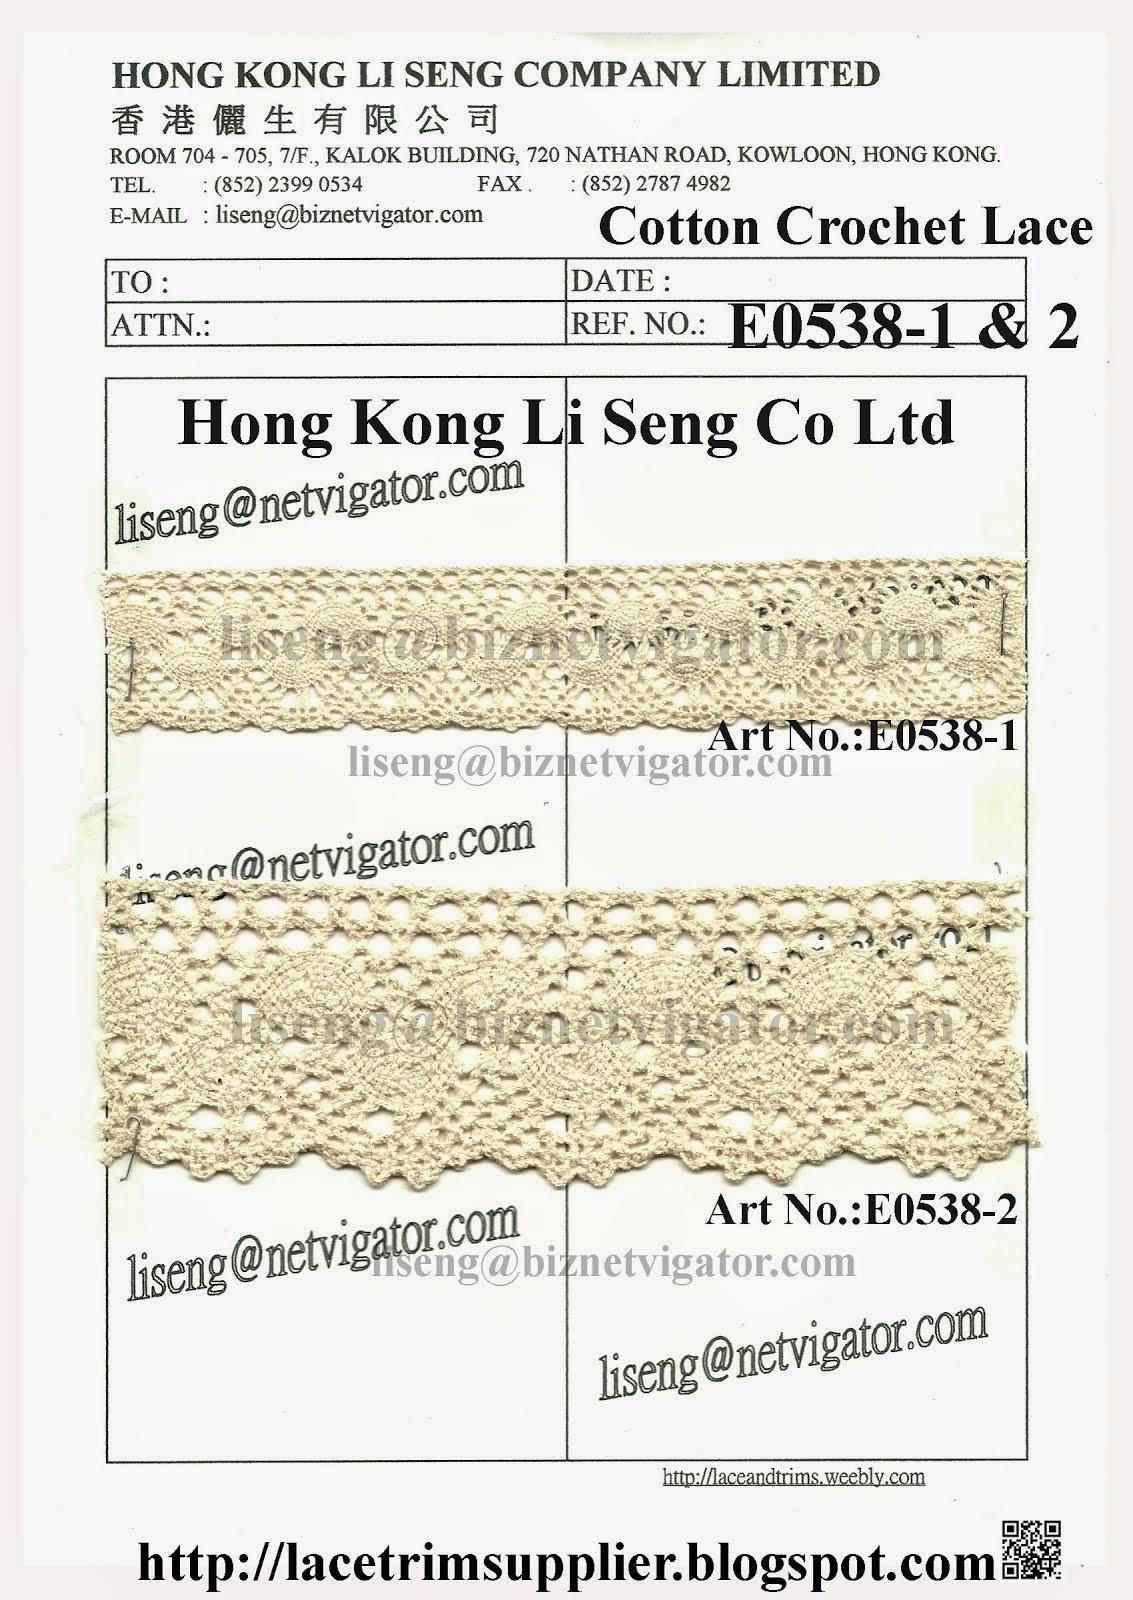 Cotton Crochet Lace Trims Factory - Hong Kong Li Seng Co Ltd